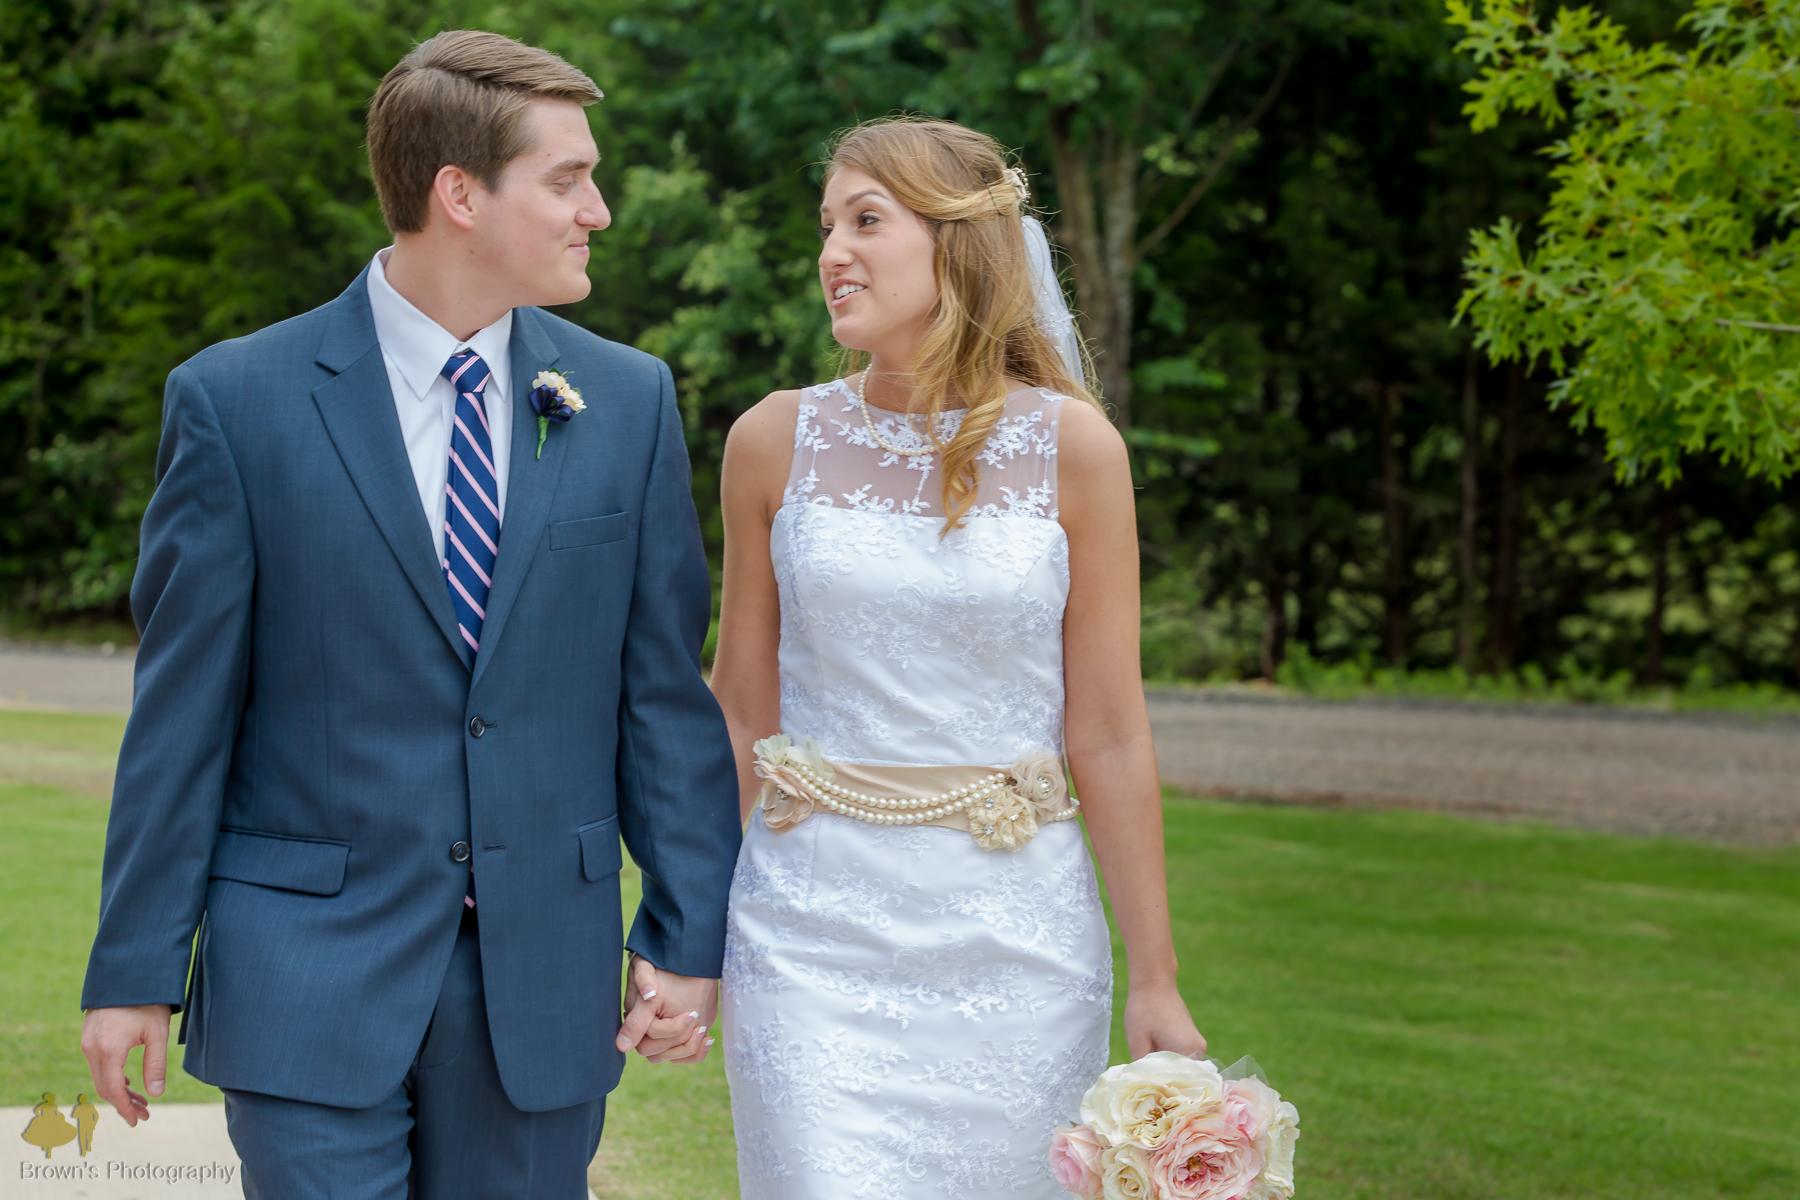 stillwater-wedding-photographer-36.jpg